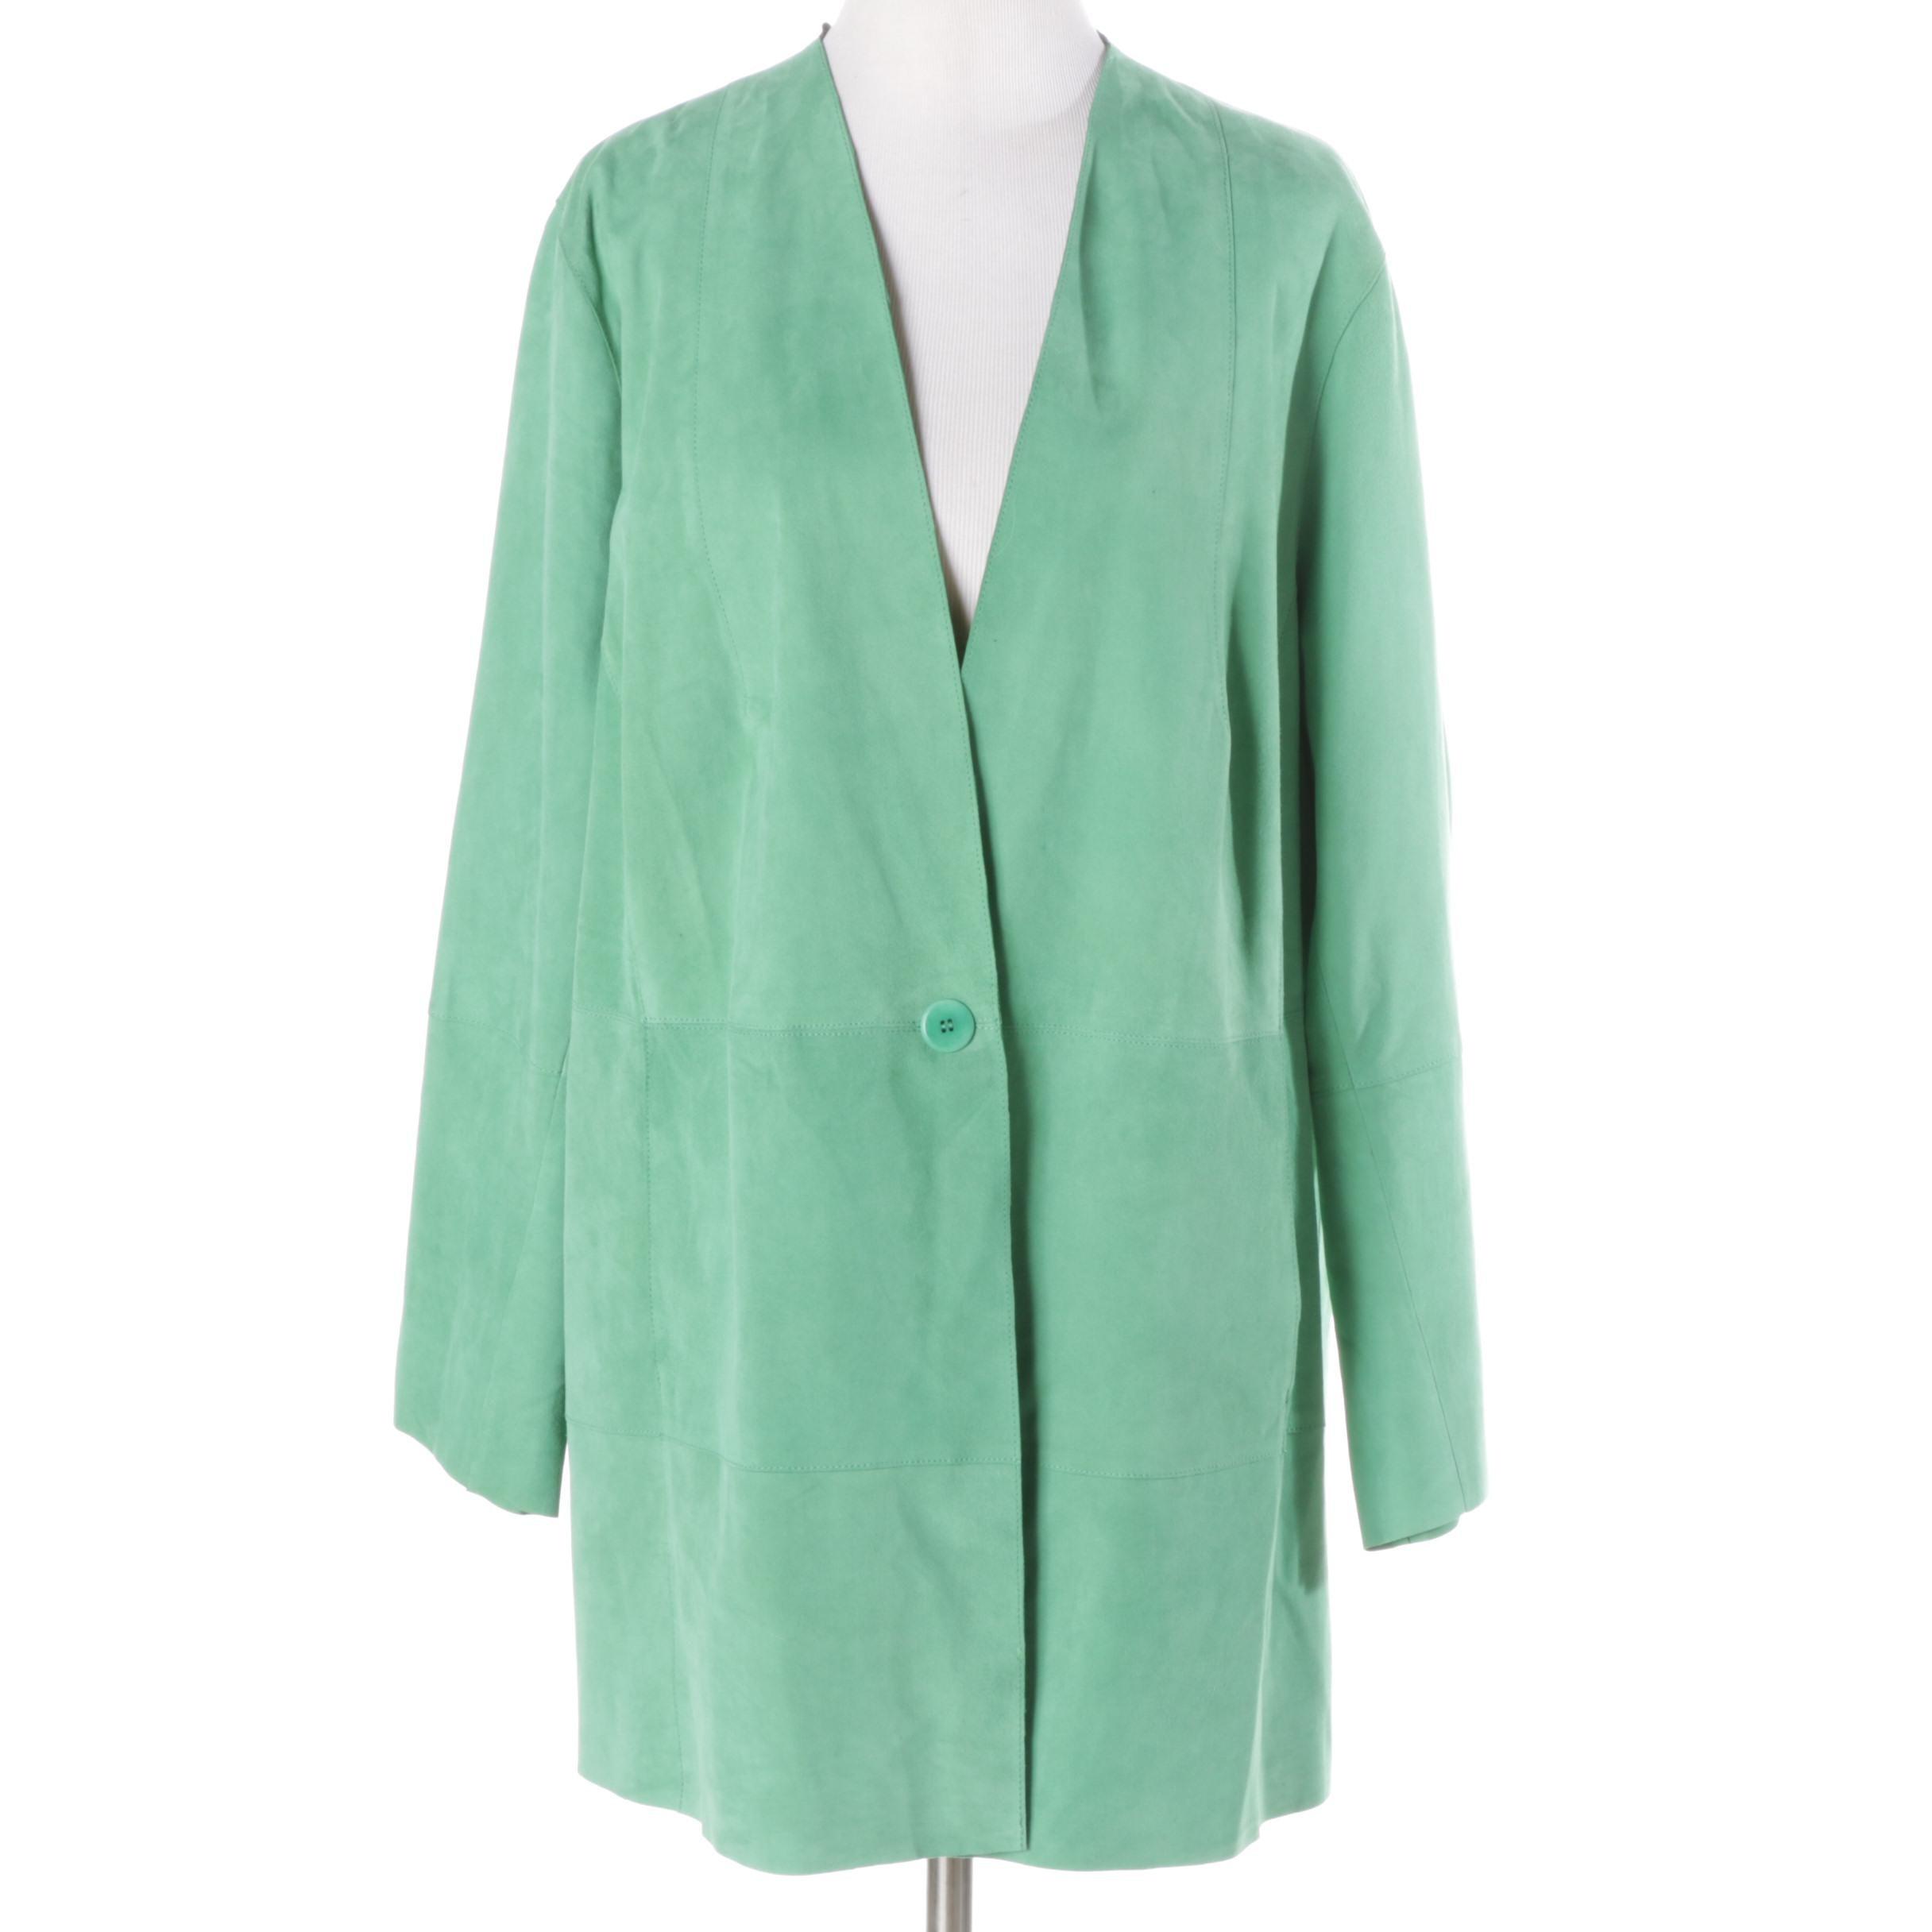 Women's Green Suede Jacket